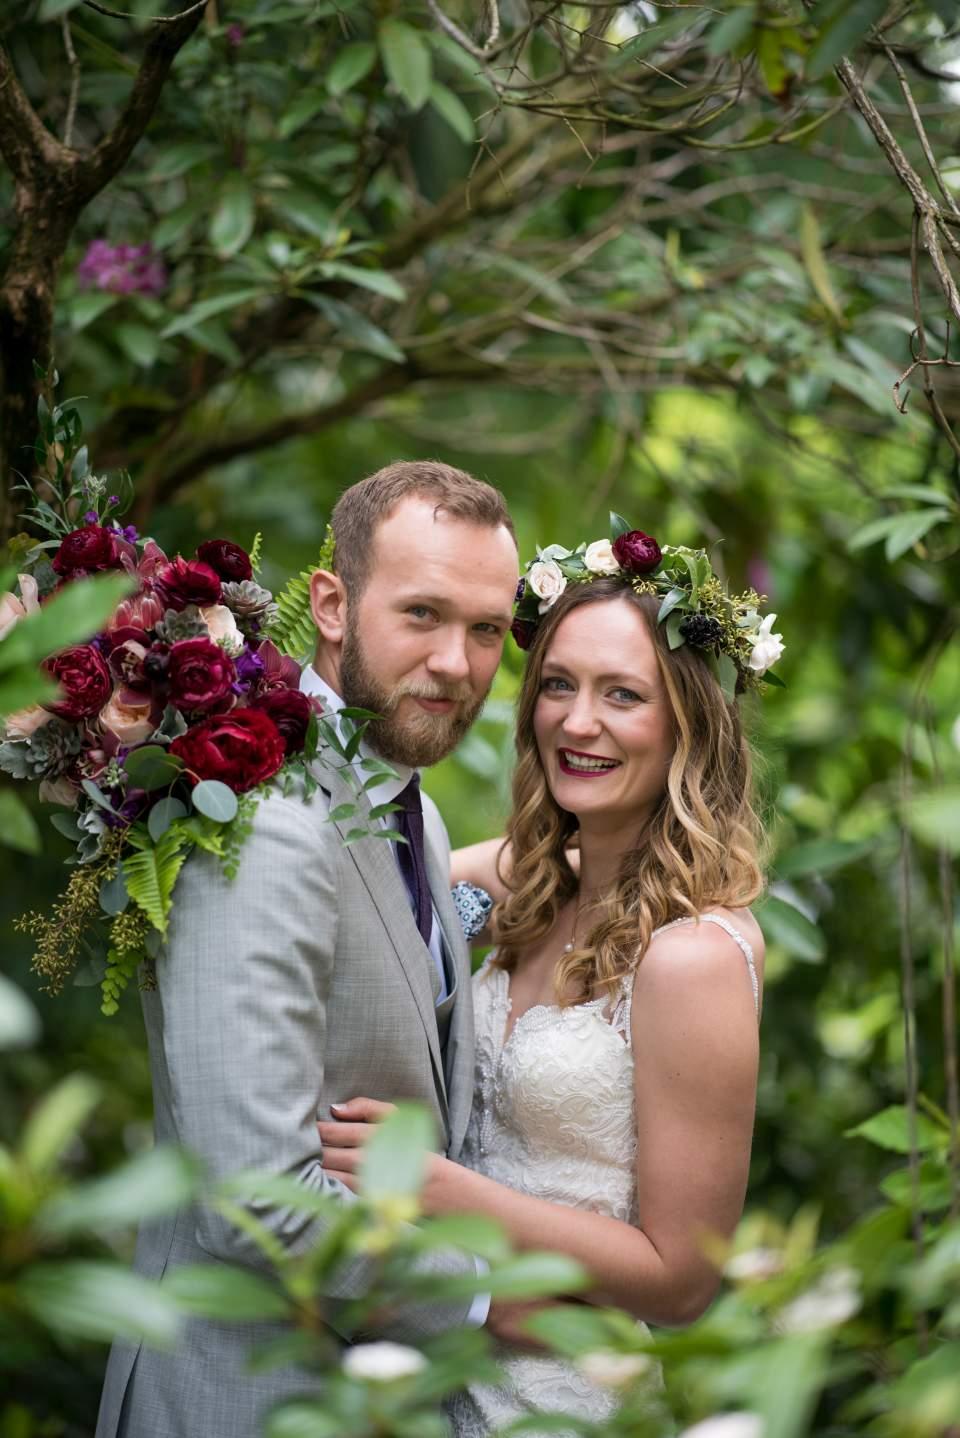 boho bride and groom on wedding day